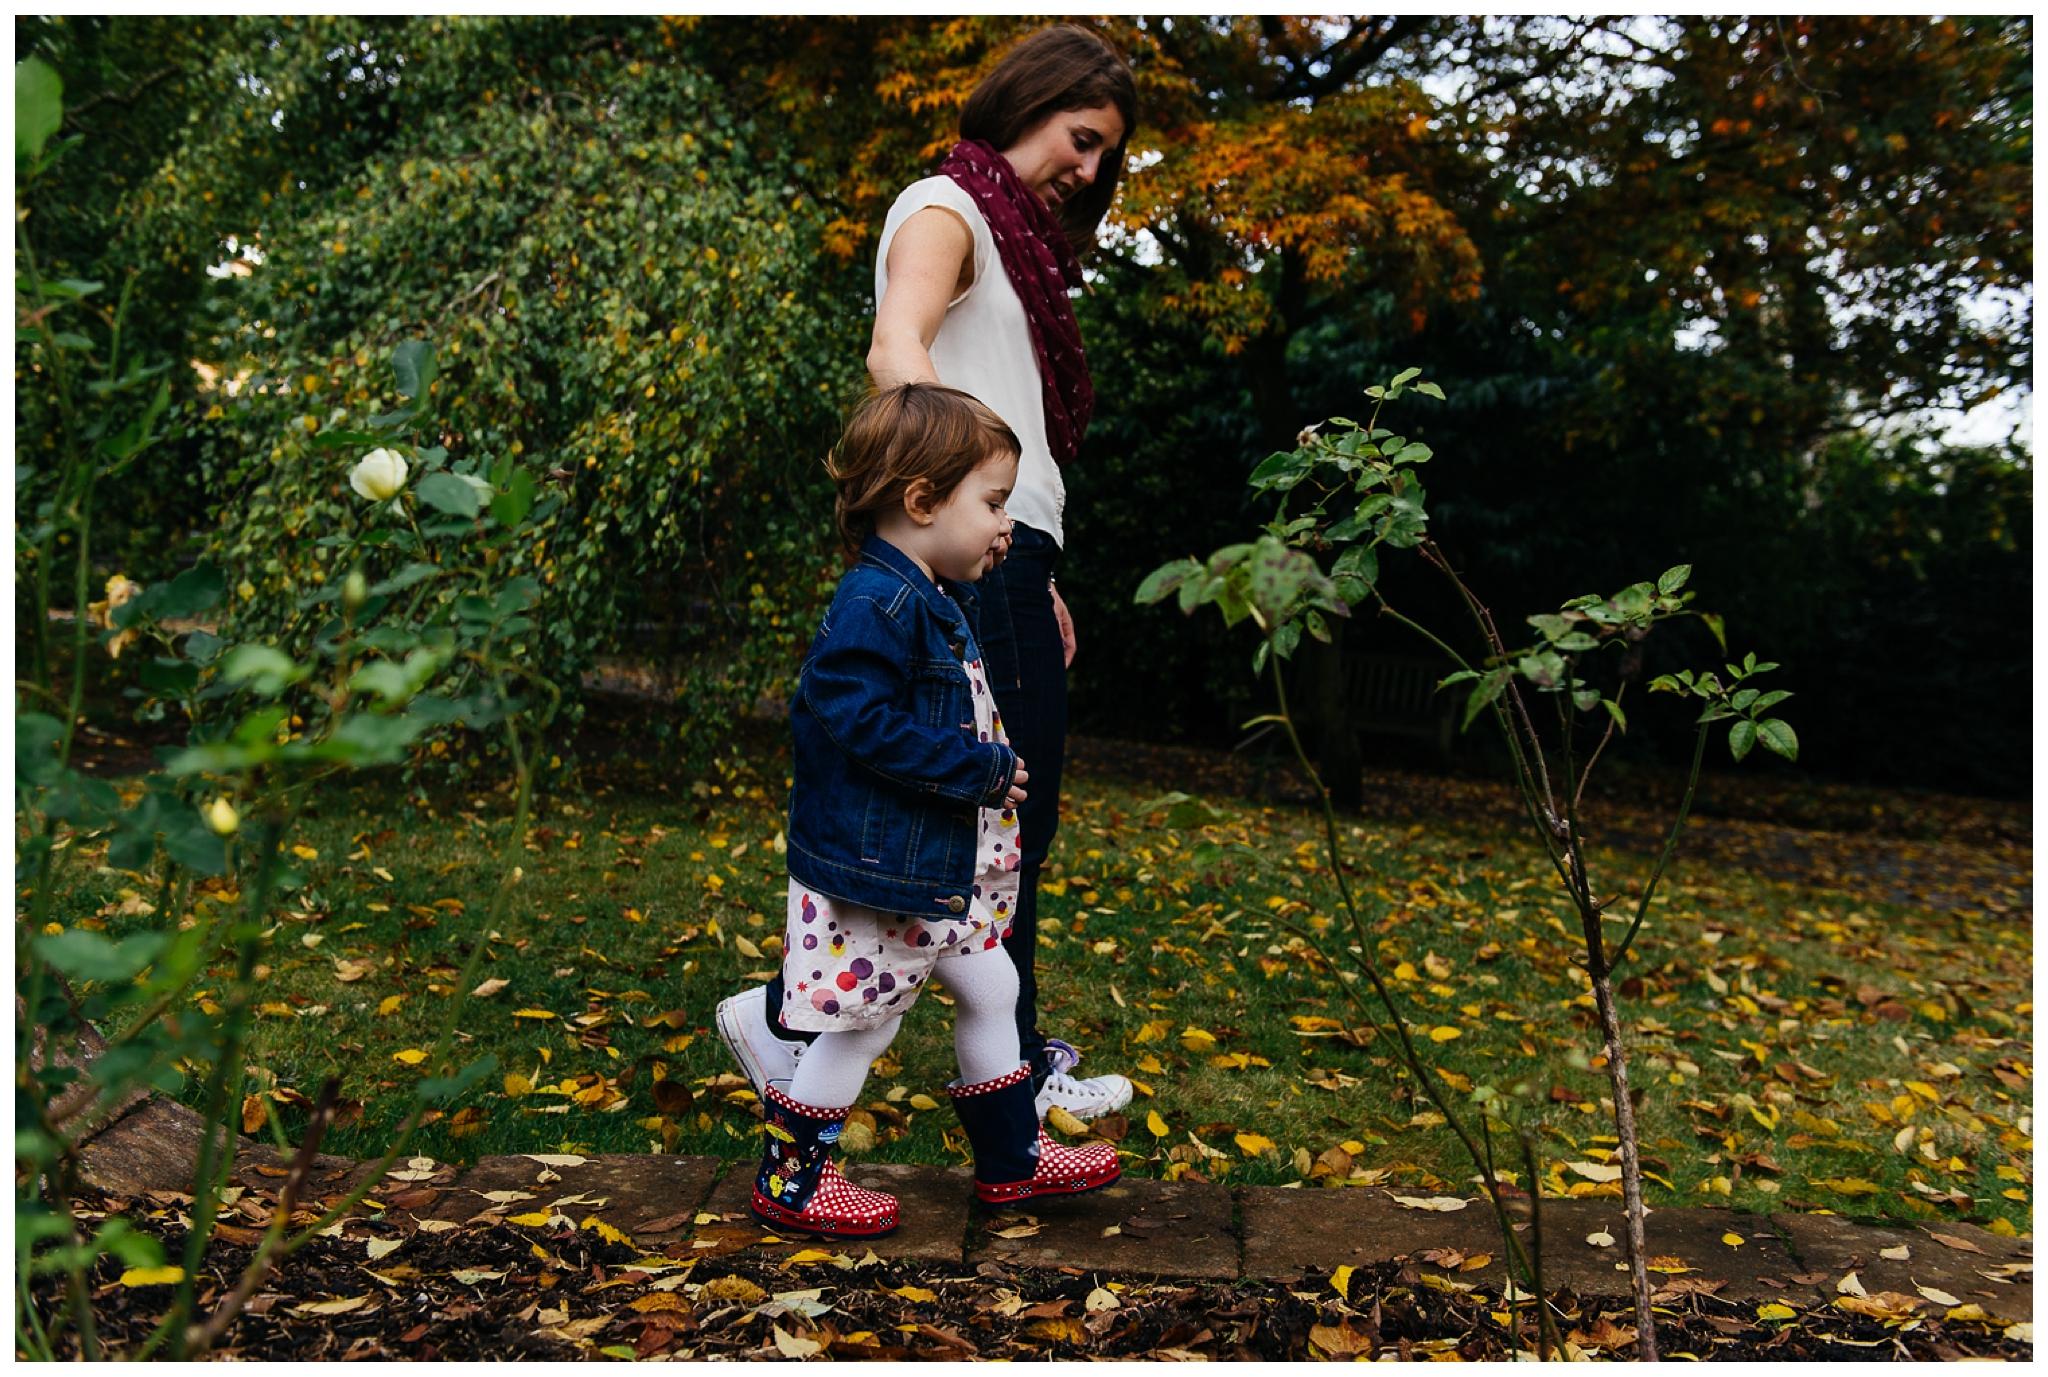 Autumn-family-portraits-birmingham-photographer_0029.jpg